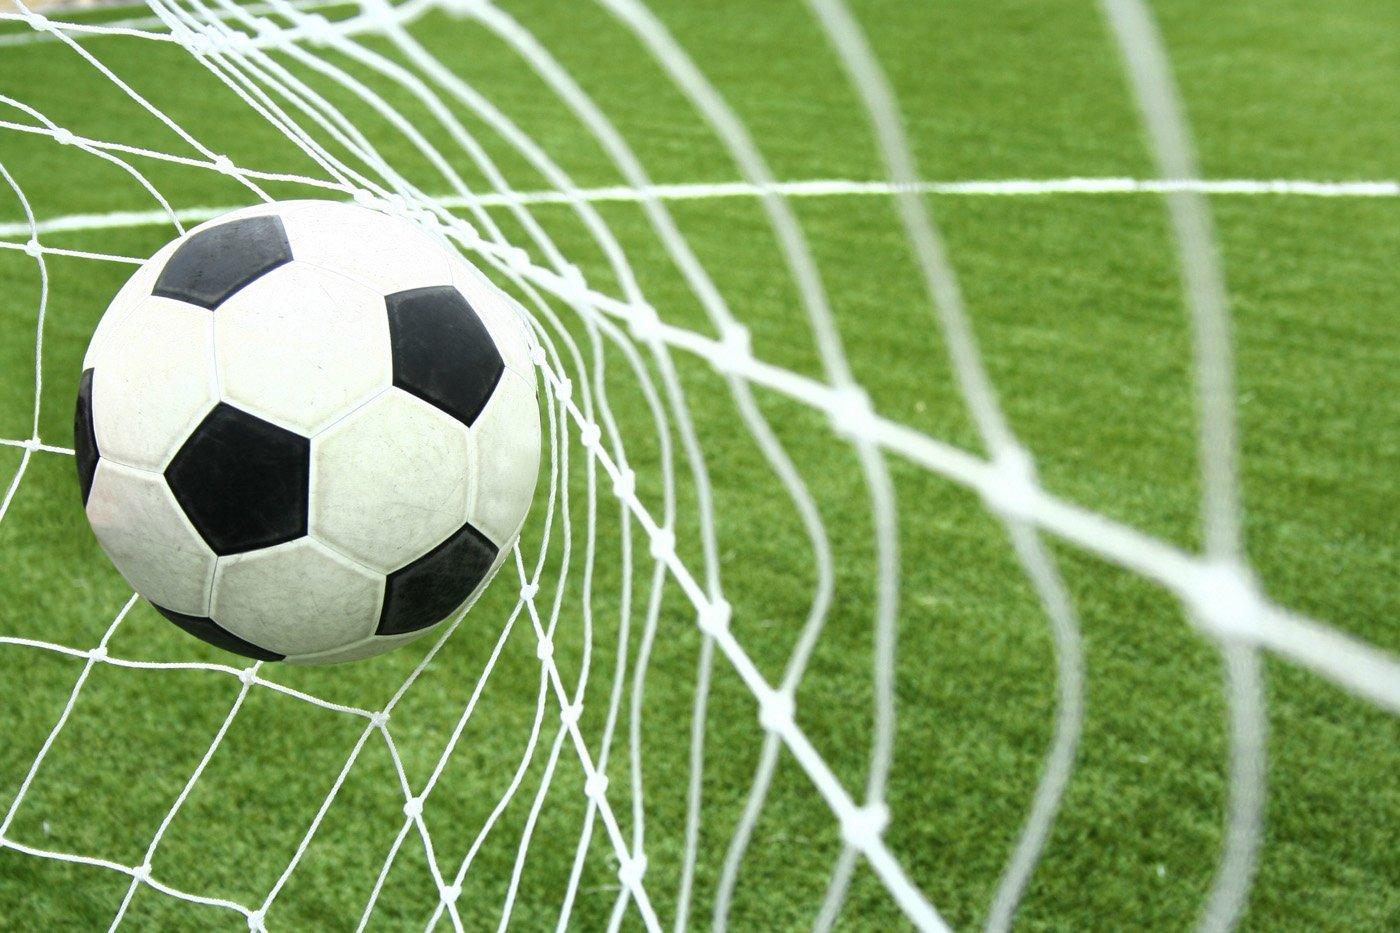 Два незабитых пенальти Агуэро непомешали «Ман Сити» разгромить «Стяуа»